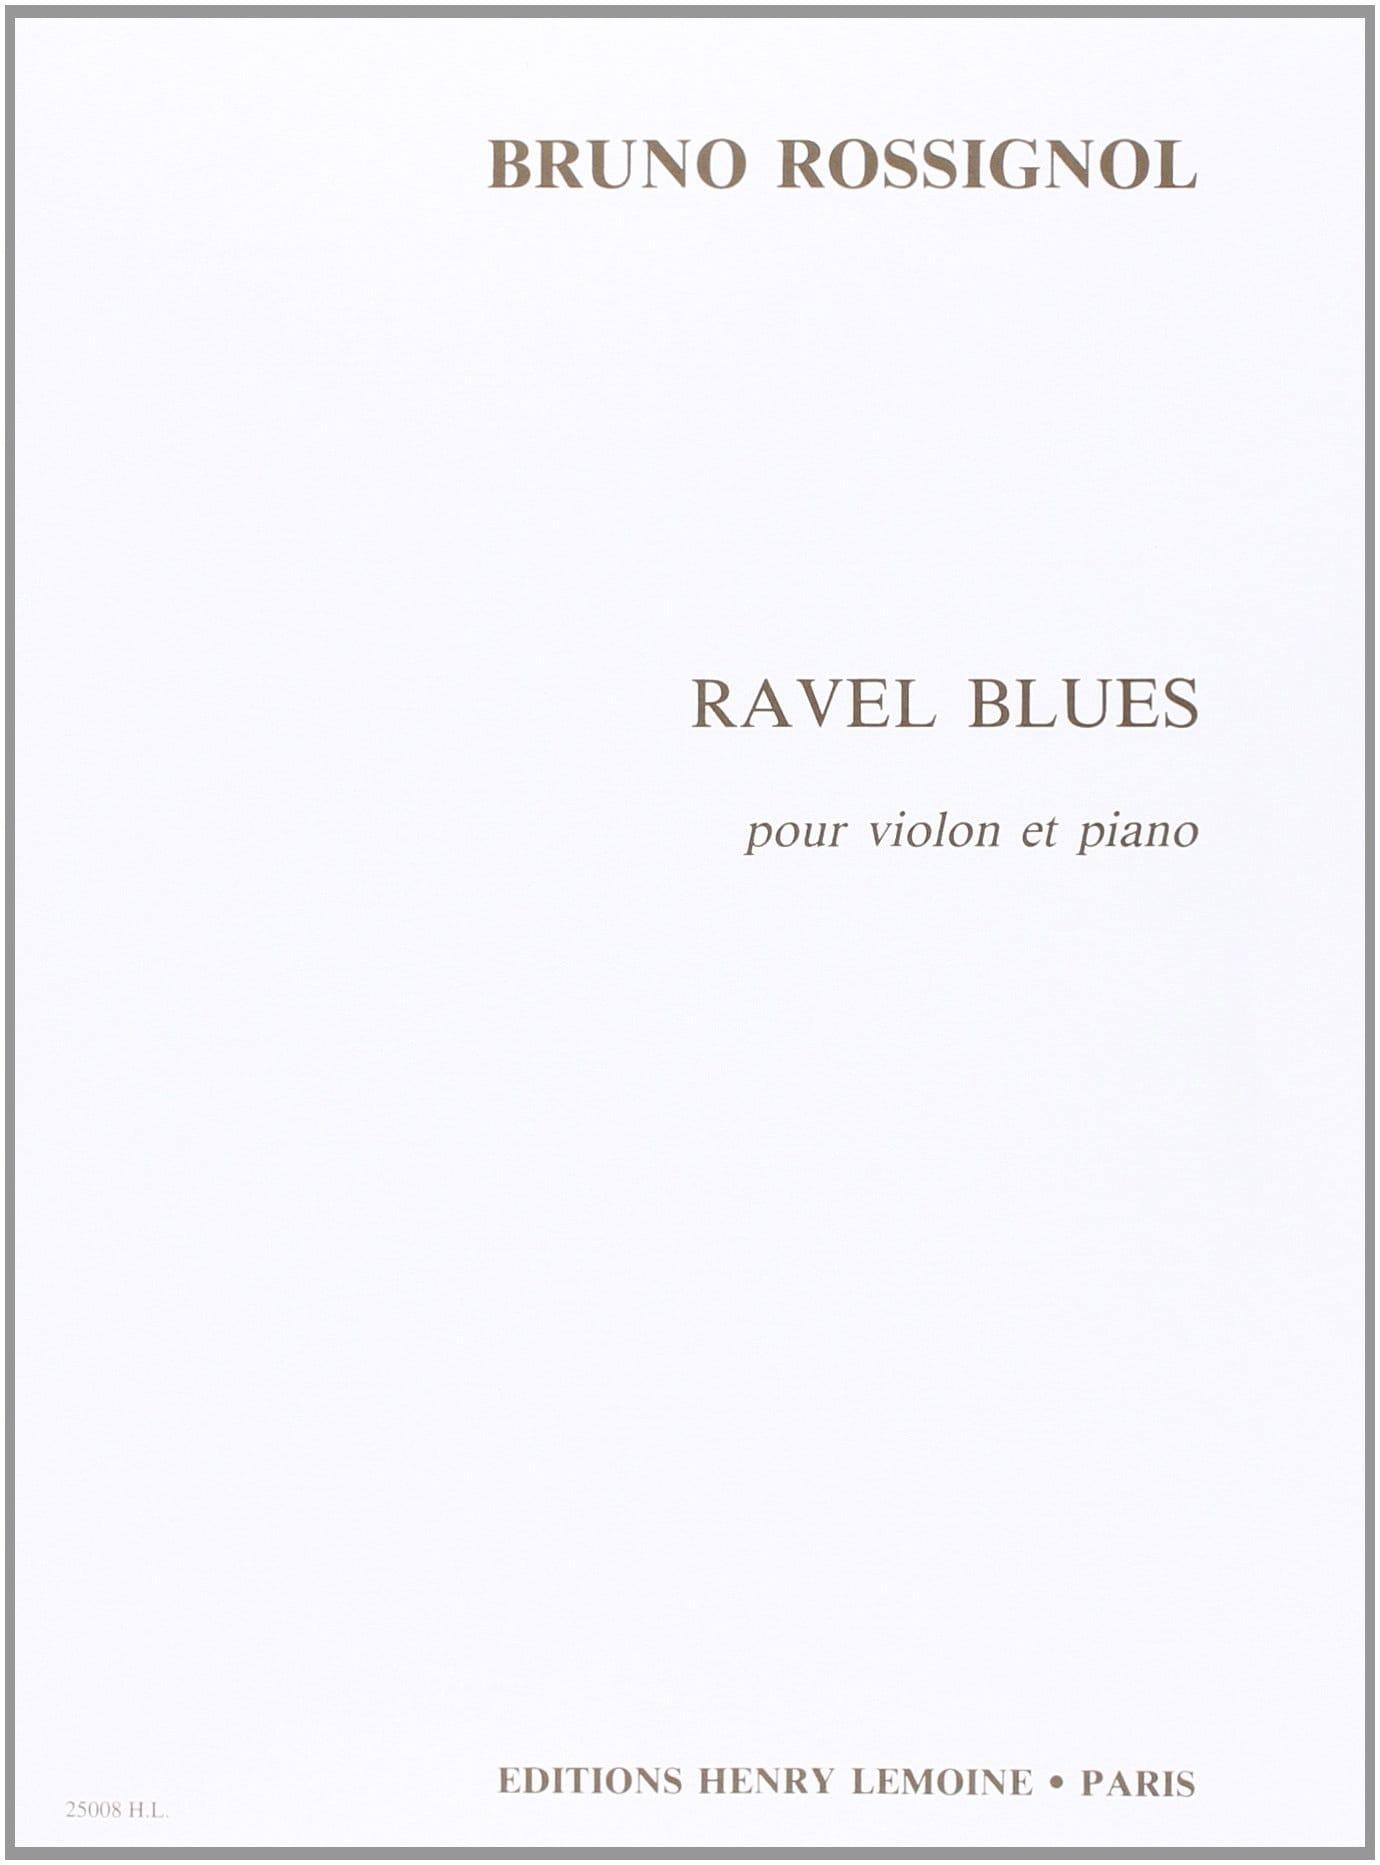 Ravel Blues - Bruno Rossignol - Partition - Violon - laflutedepan.com